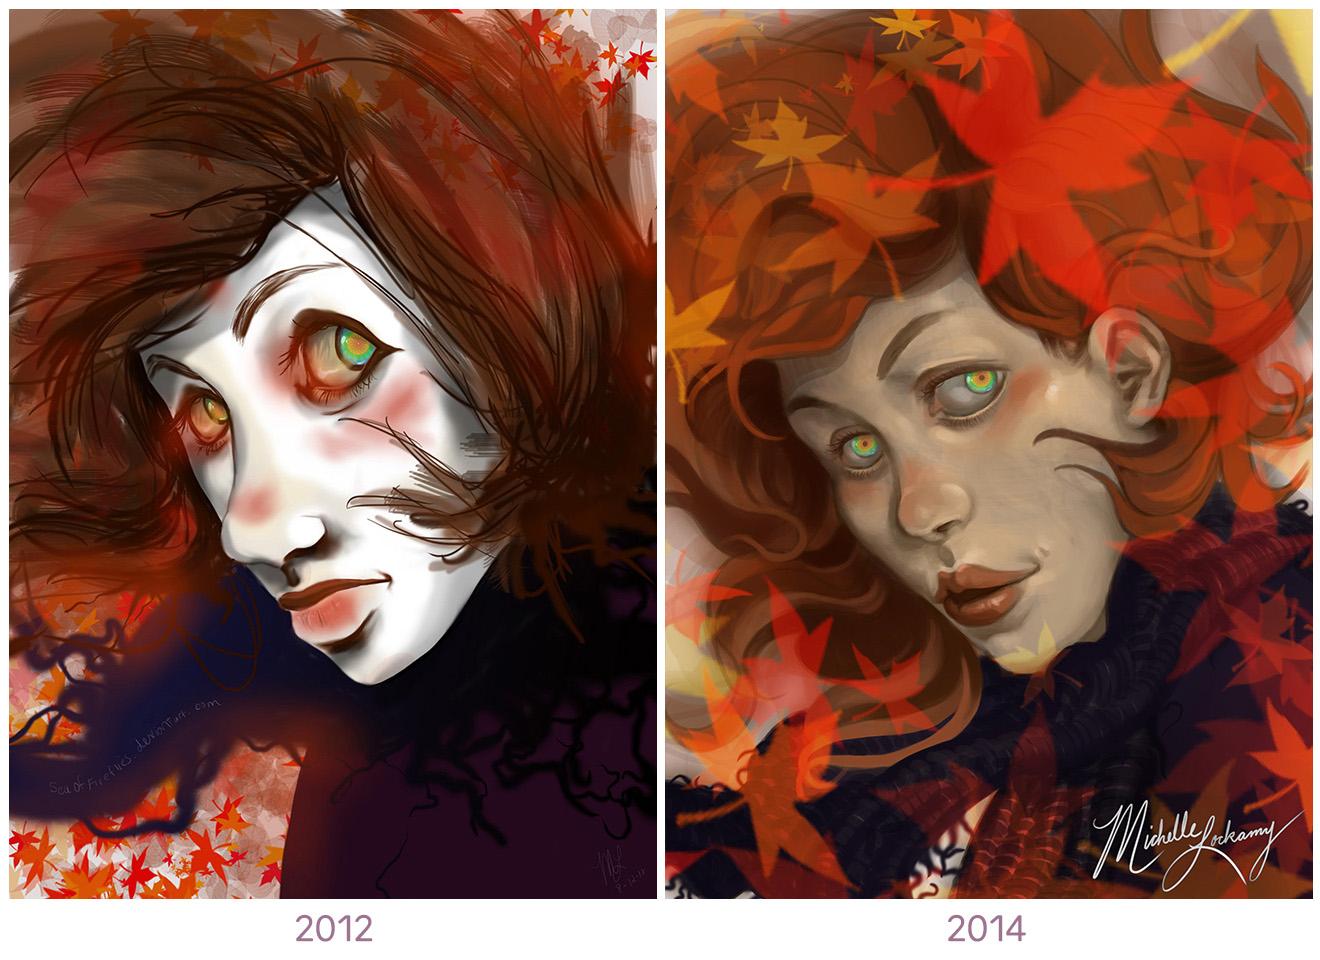 Lockamy_Old Autumns_2012 and 2014.jpg